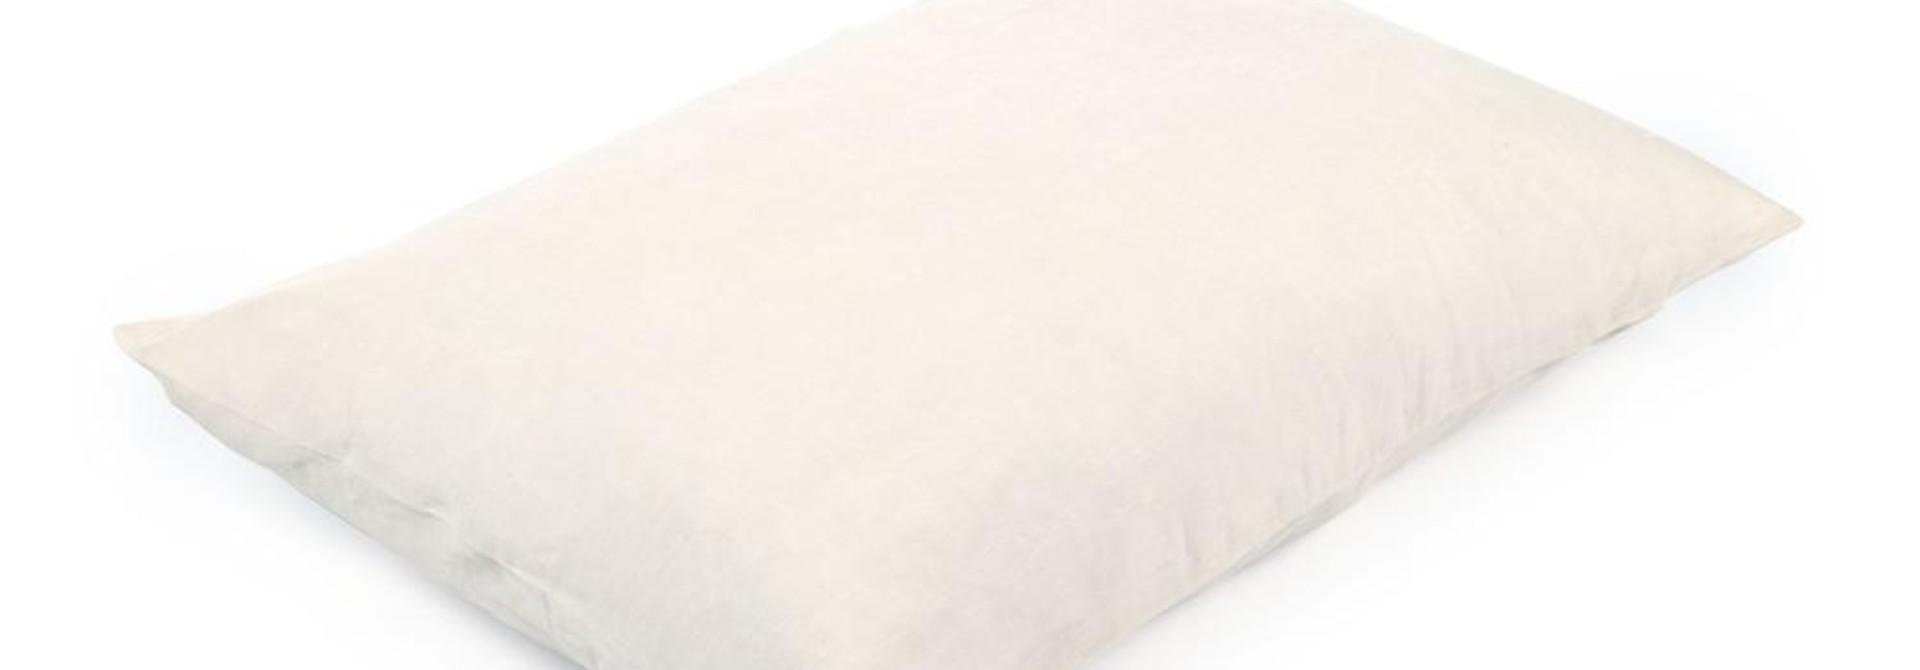 Pillow Sham - Santiago - White Sand - Queen